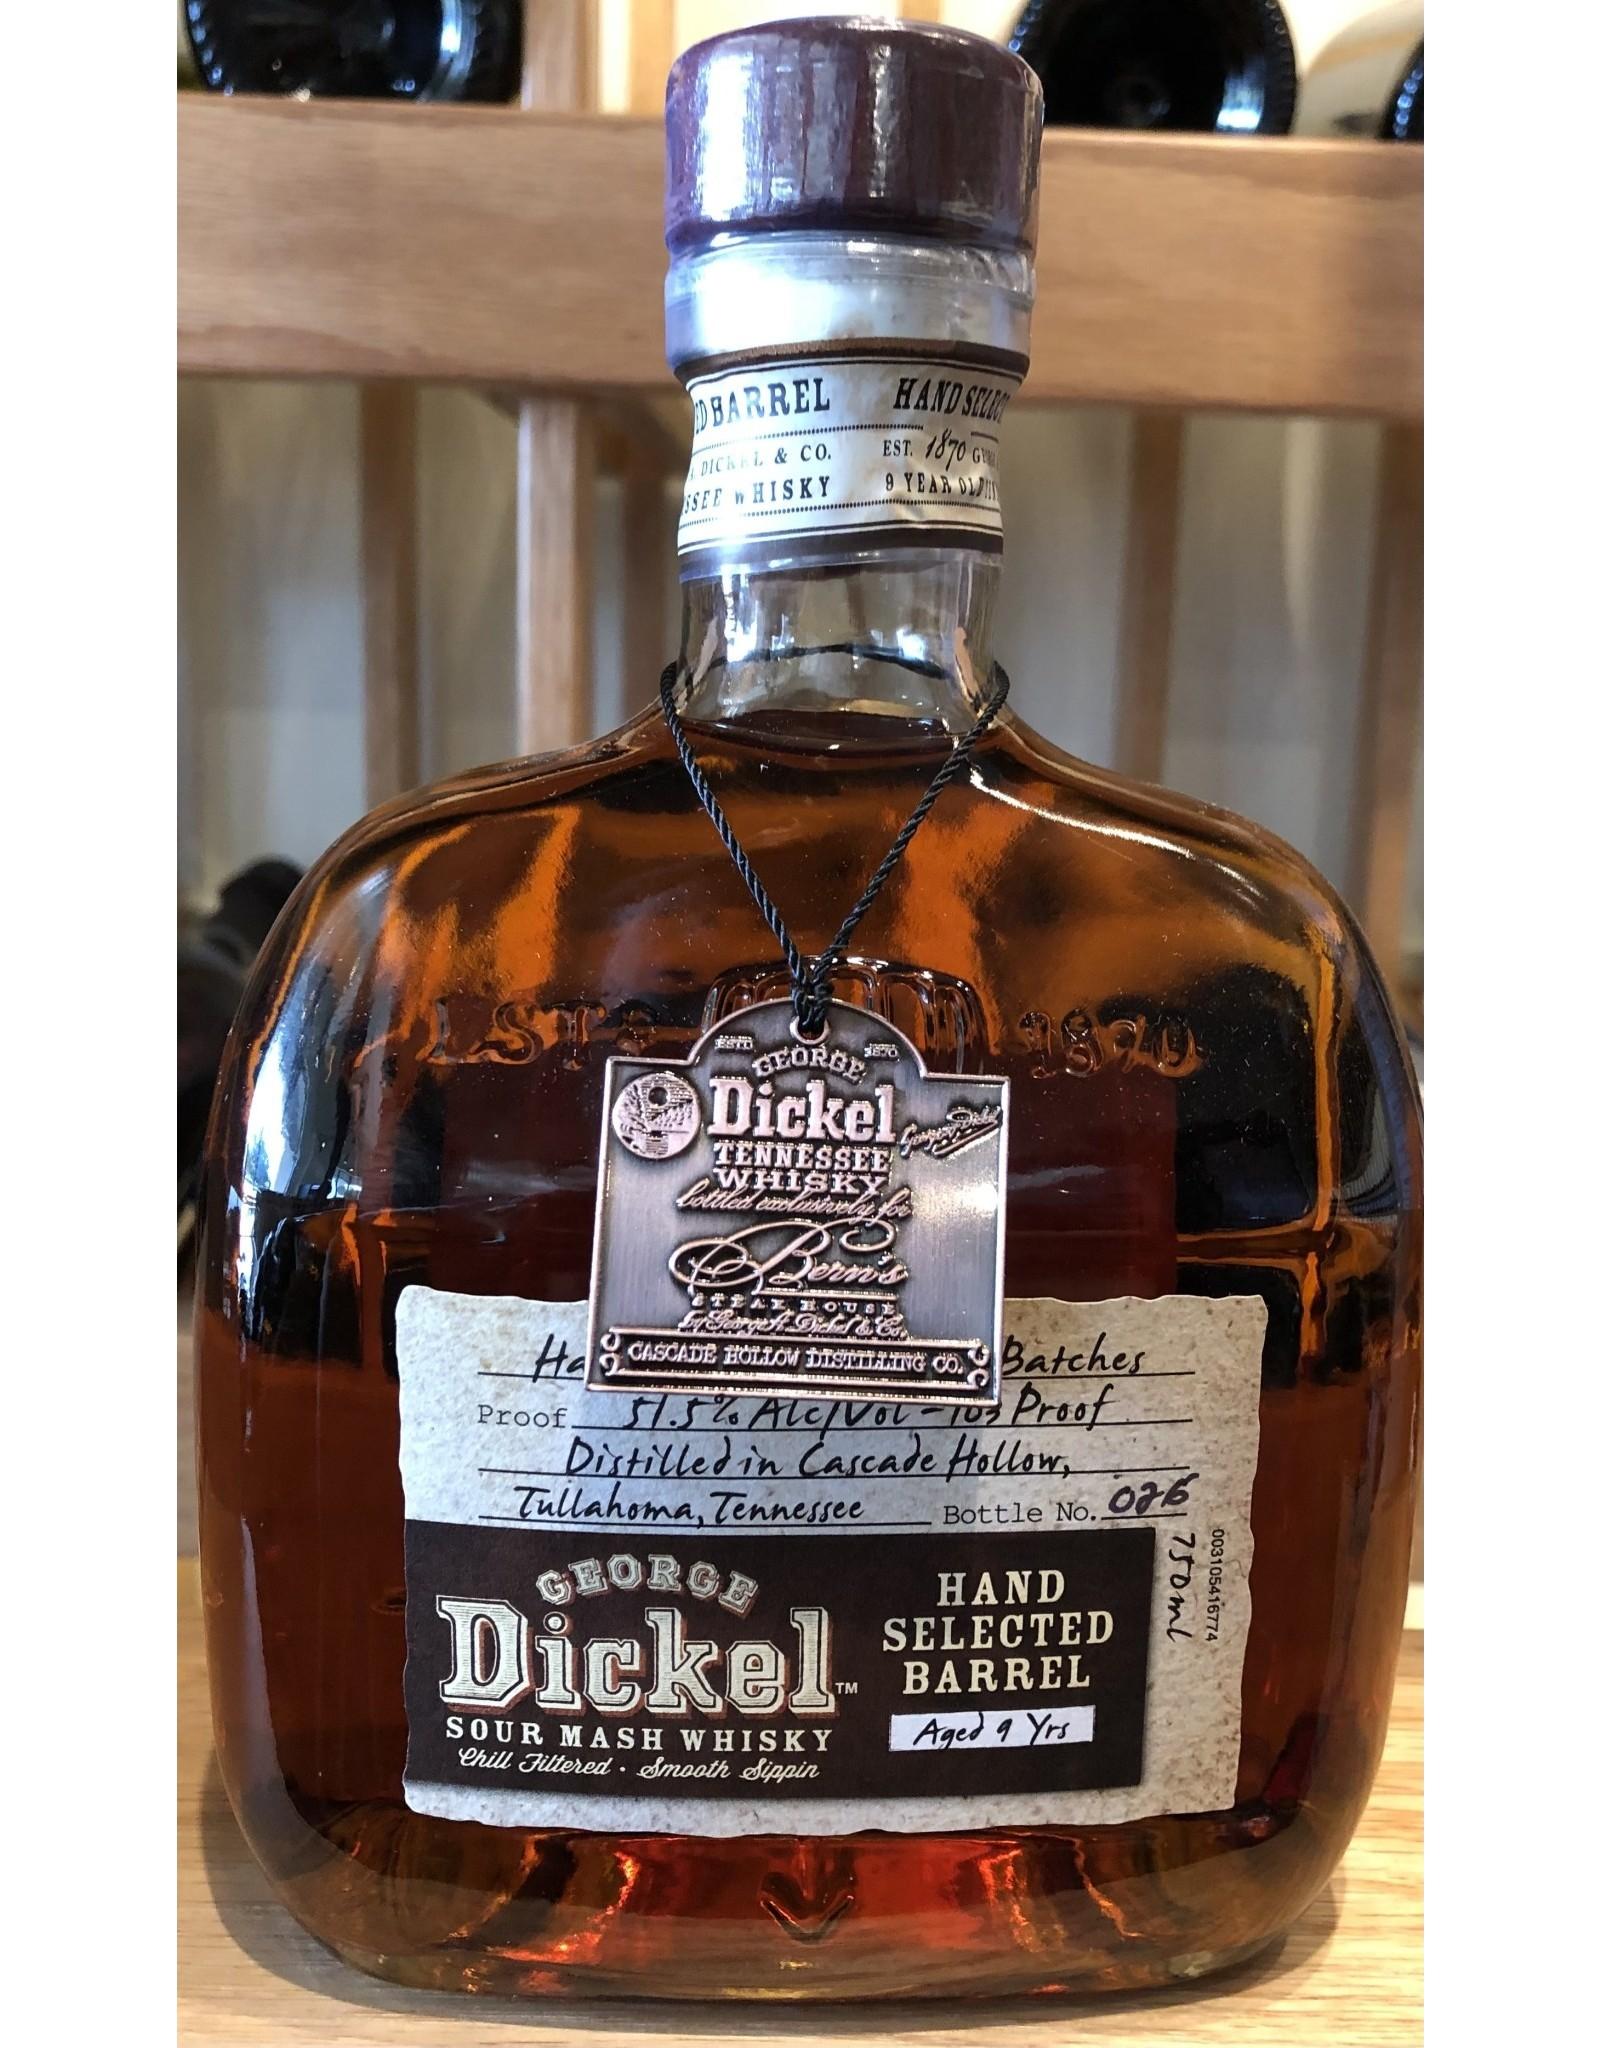 Bern's Select George Dickel Barrel 9 year Single Barrel Tennessee Whisky